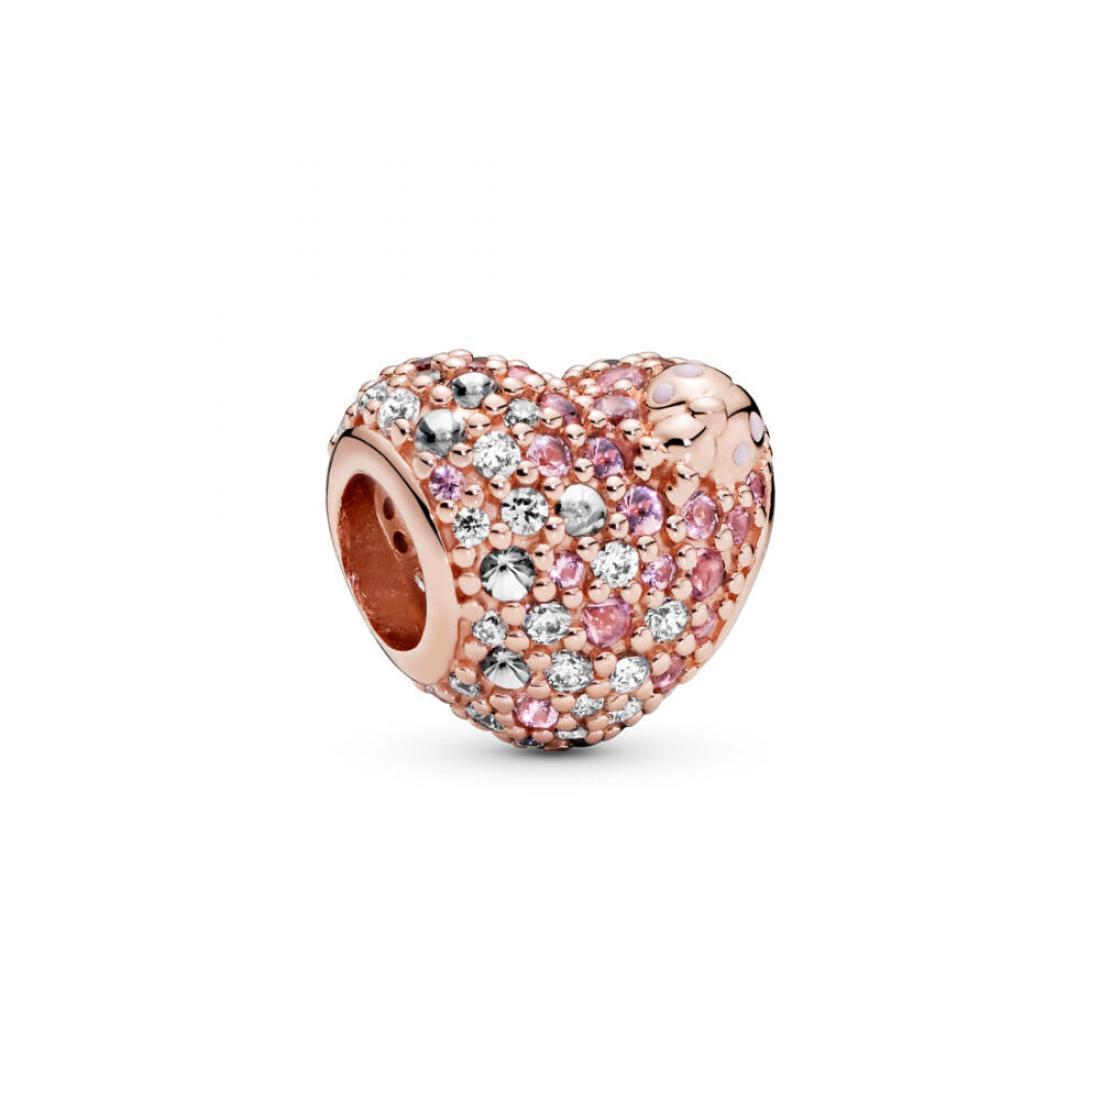 Mini Enamel Ladybug Pink Sparkle Crystal Charm Beads Set of 3